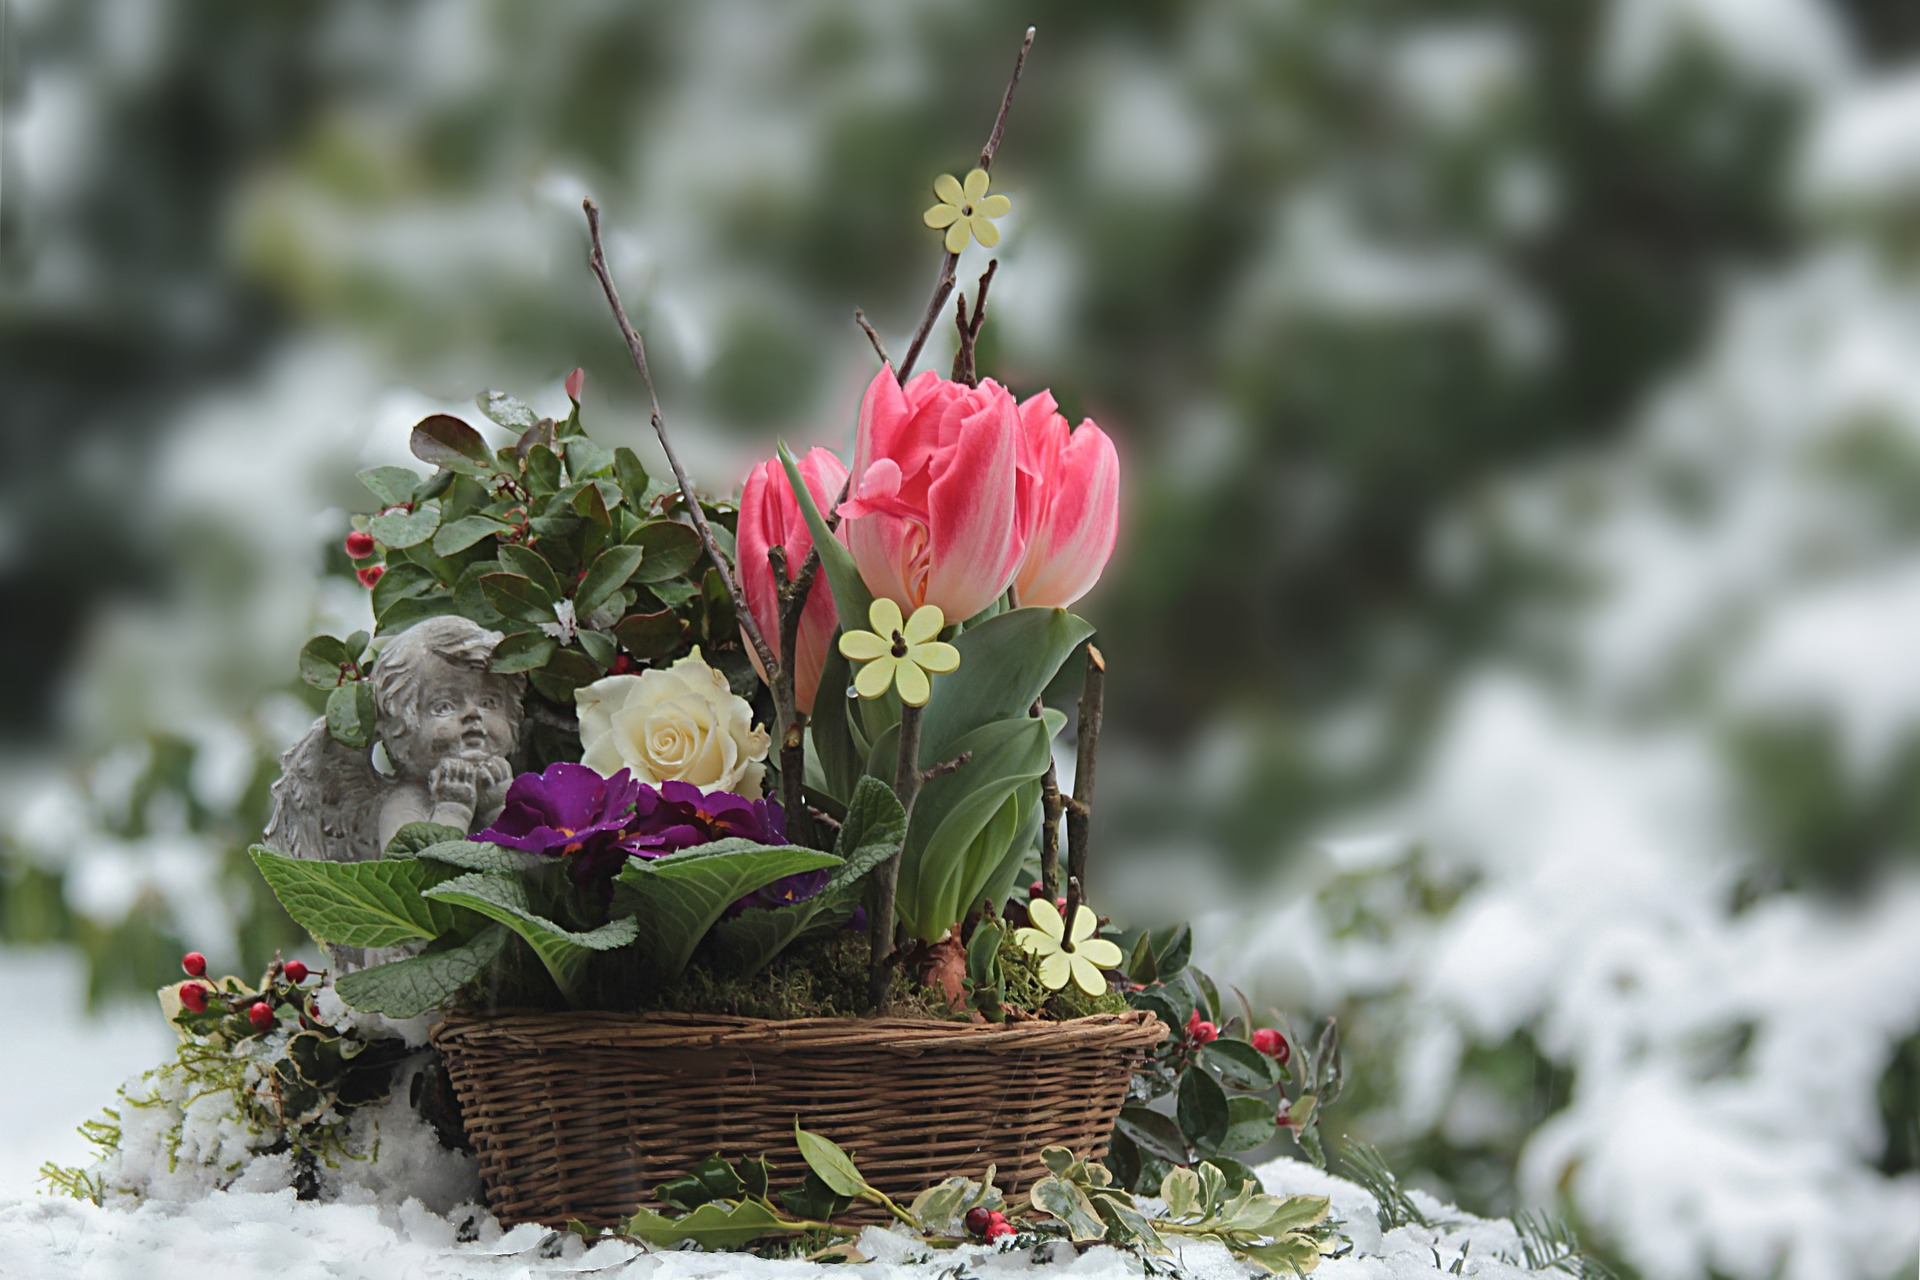 Winterizing A Garden and Landscape